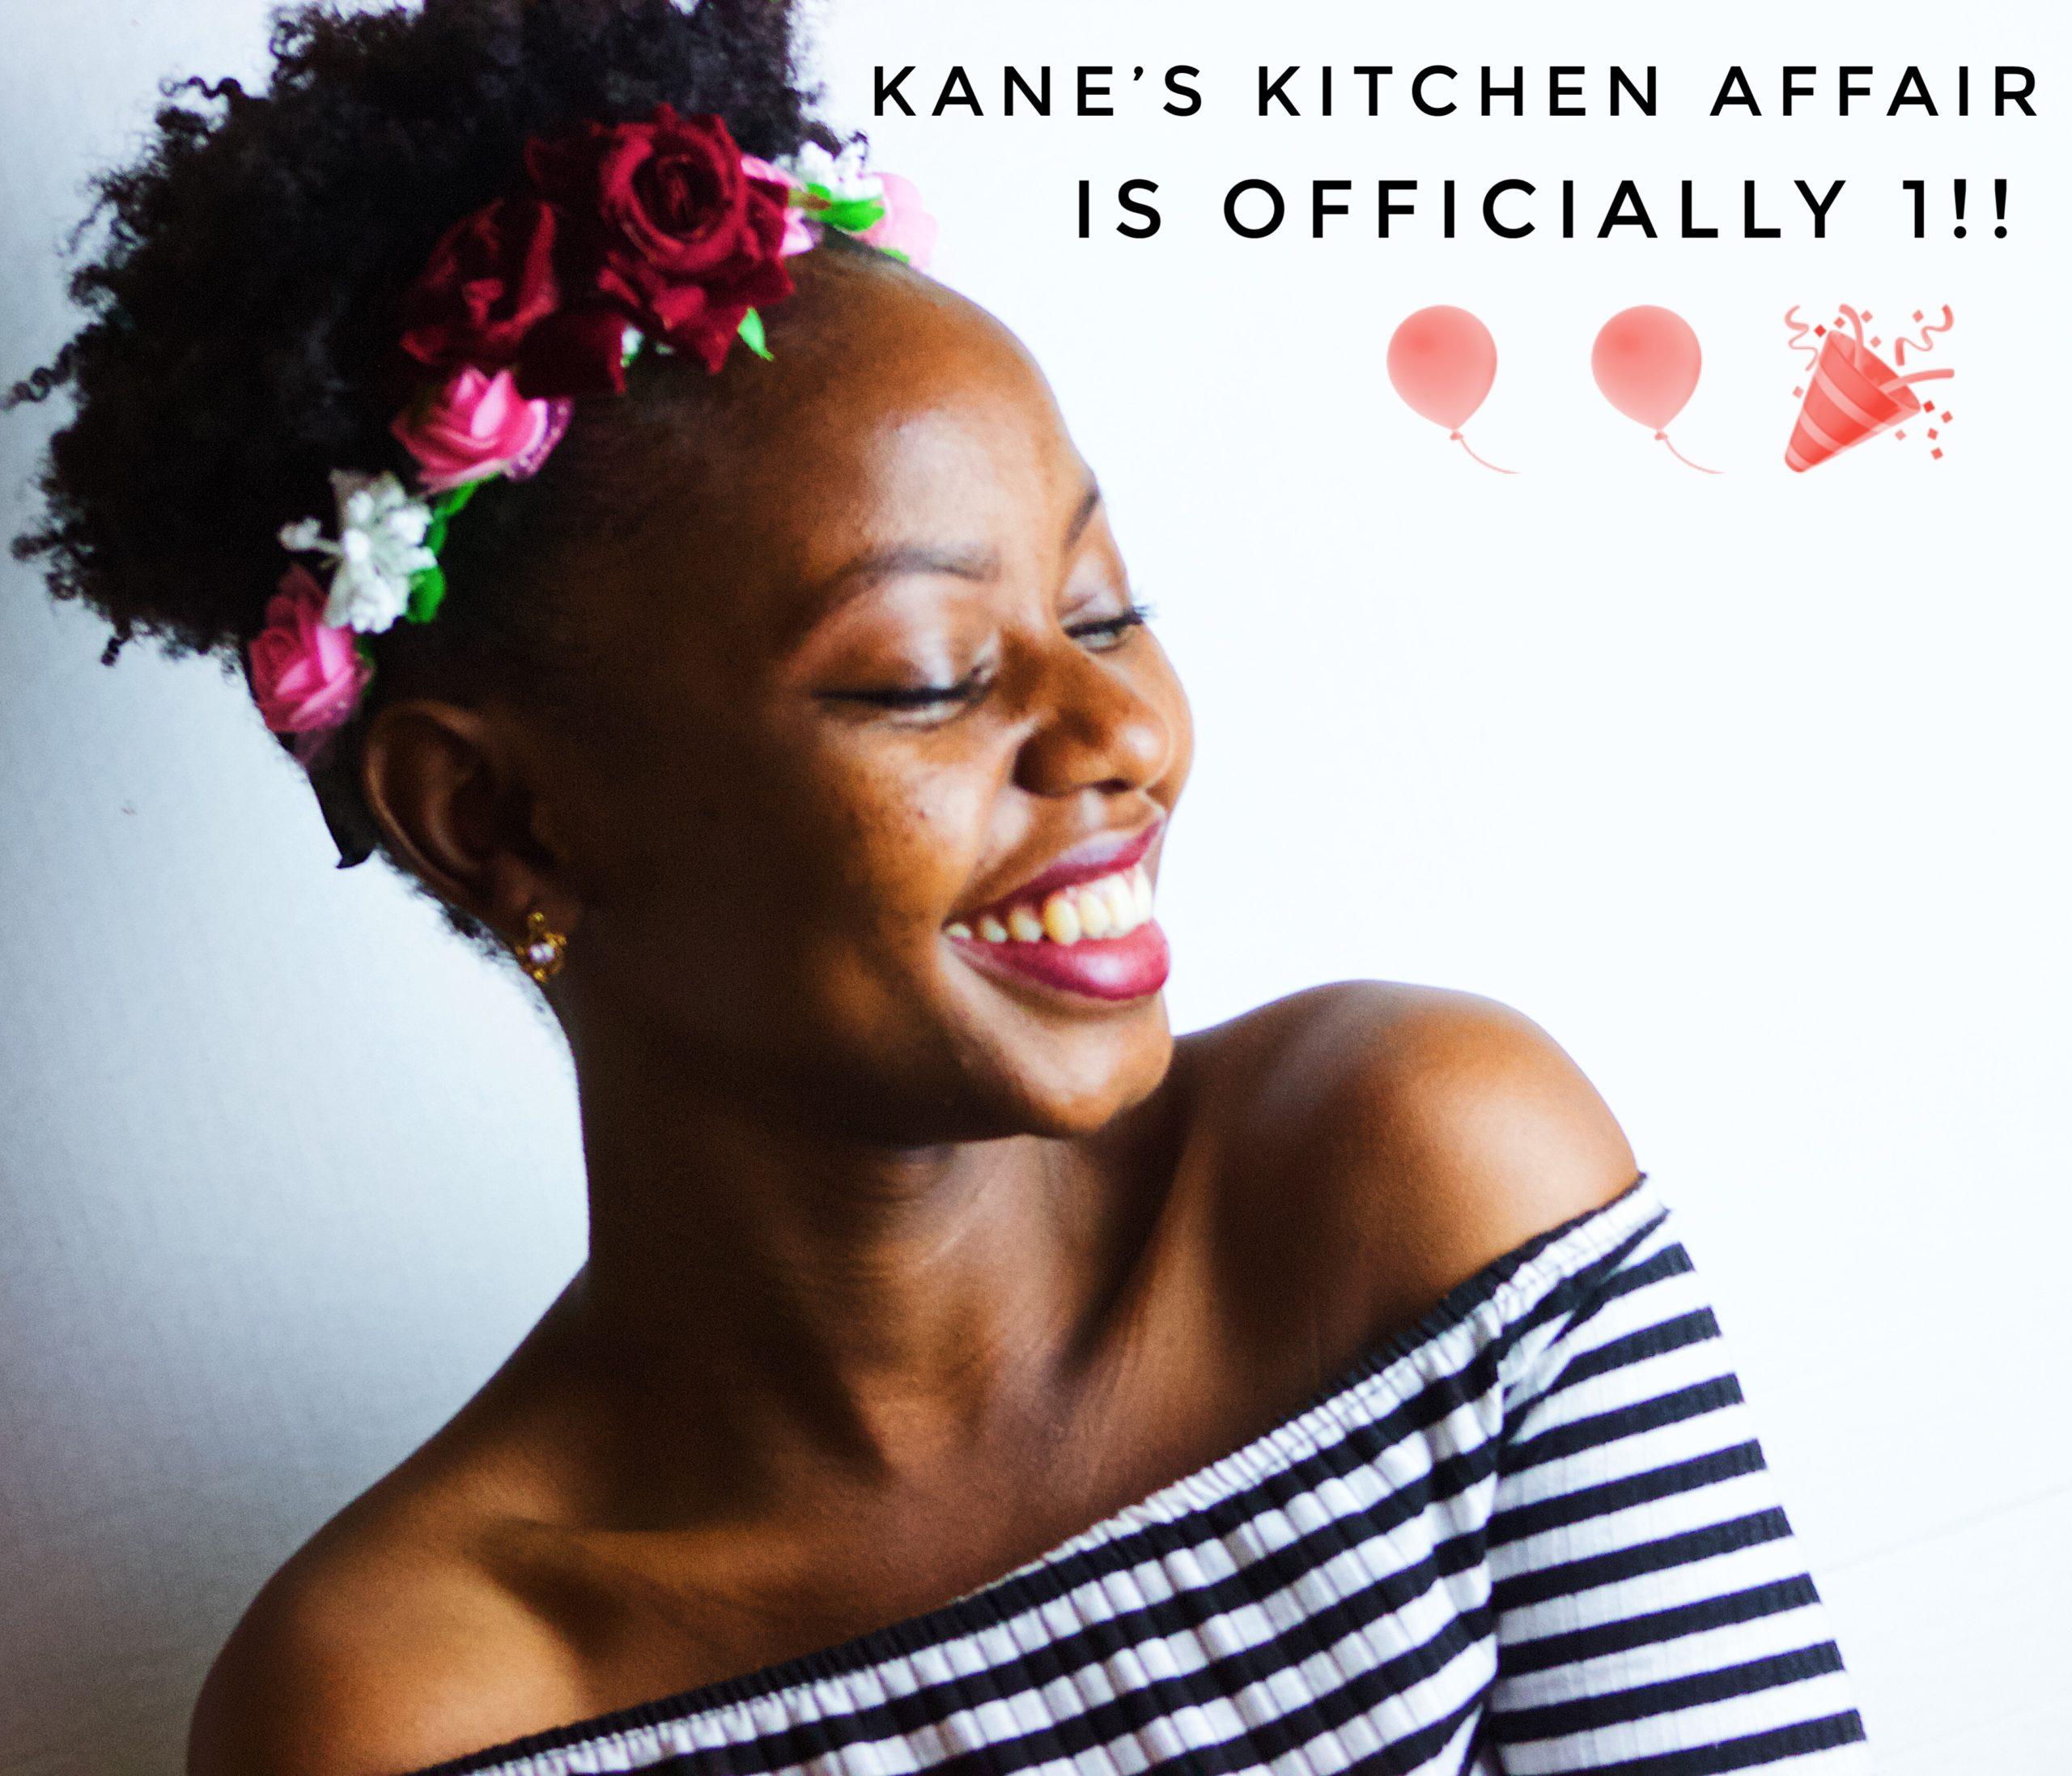 Kane S Kitchen Affair Is 1 Year Old Today Kane S Kitchen